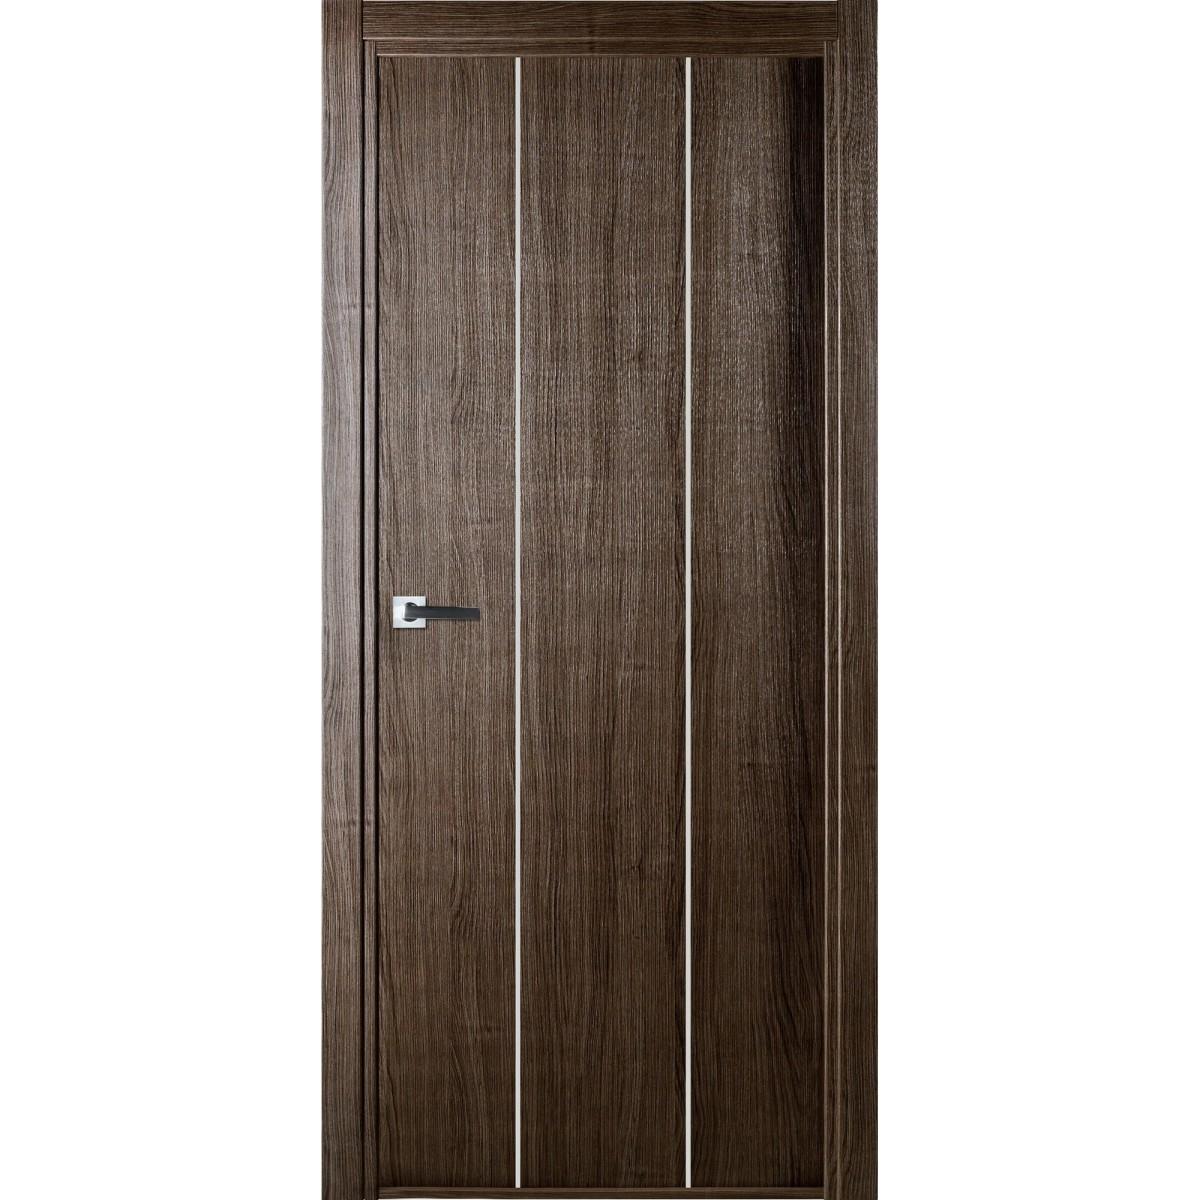 Дверь Межкомнатная Глухая Спэйс 90x200 Ламинация Цвет Серый Дуб С Фурнитурой